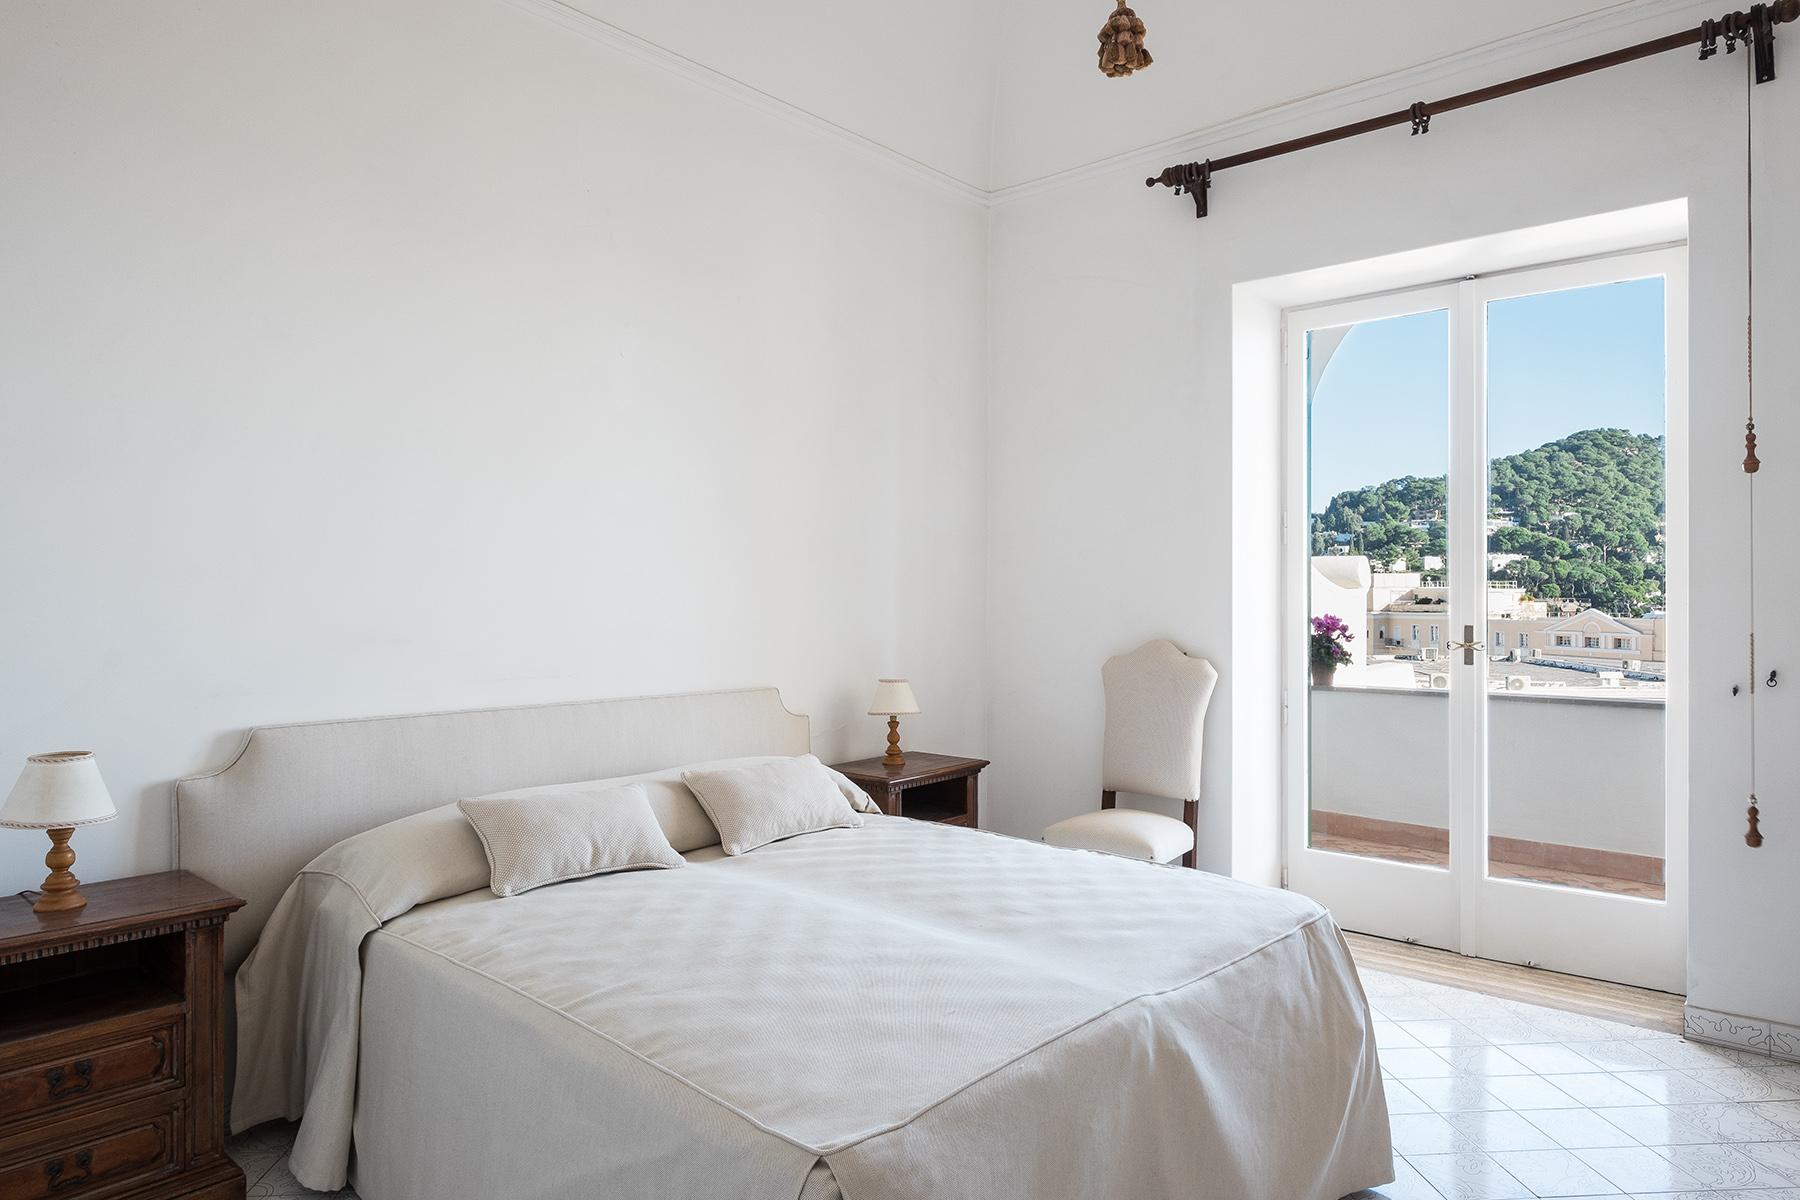 Casa indipendente in Vendita a Capri: 5 locali, 400 mq - Foto 16